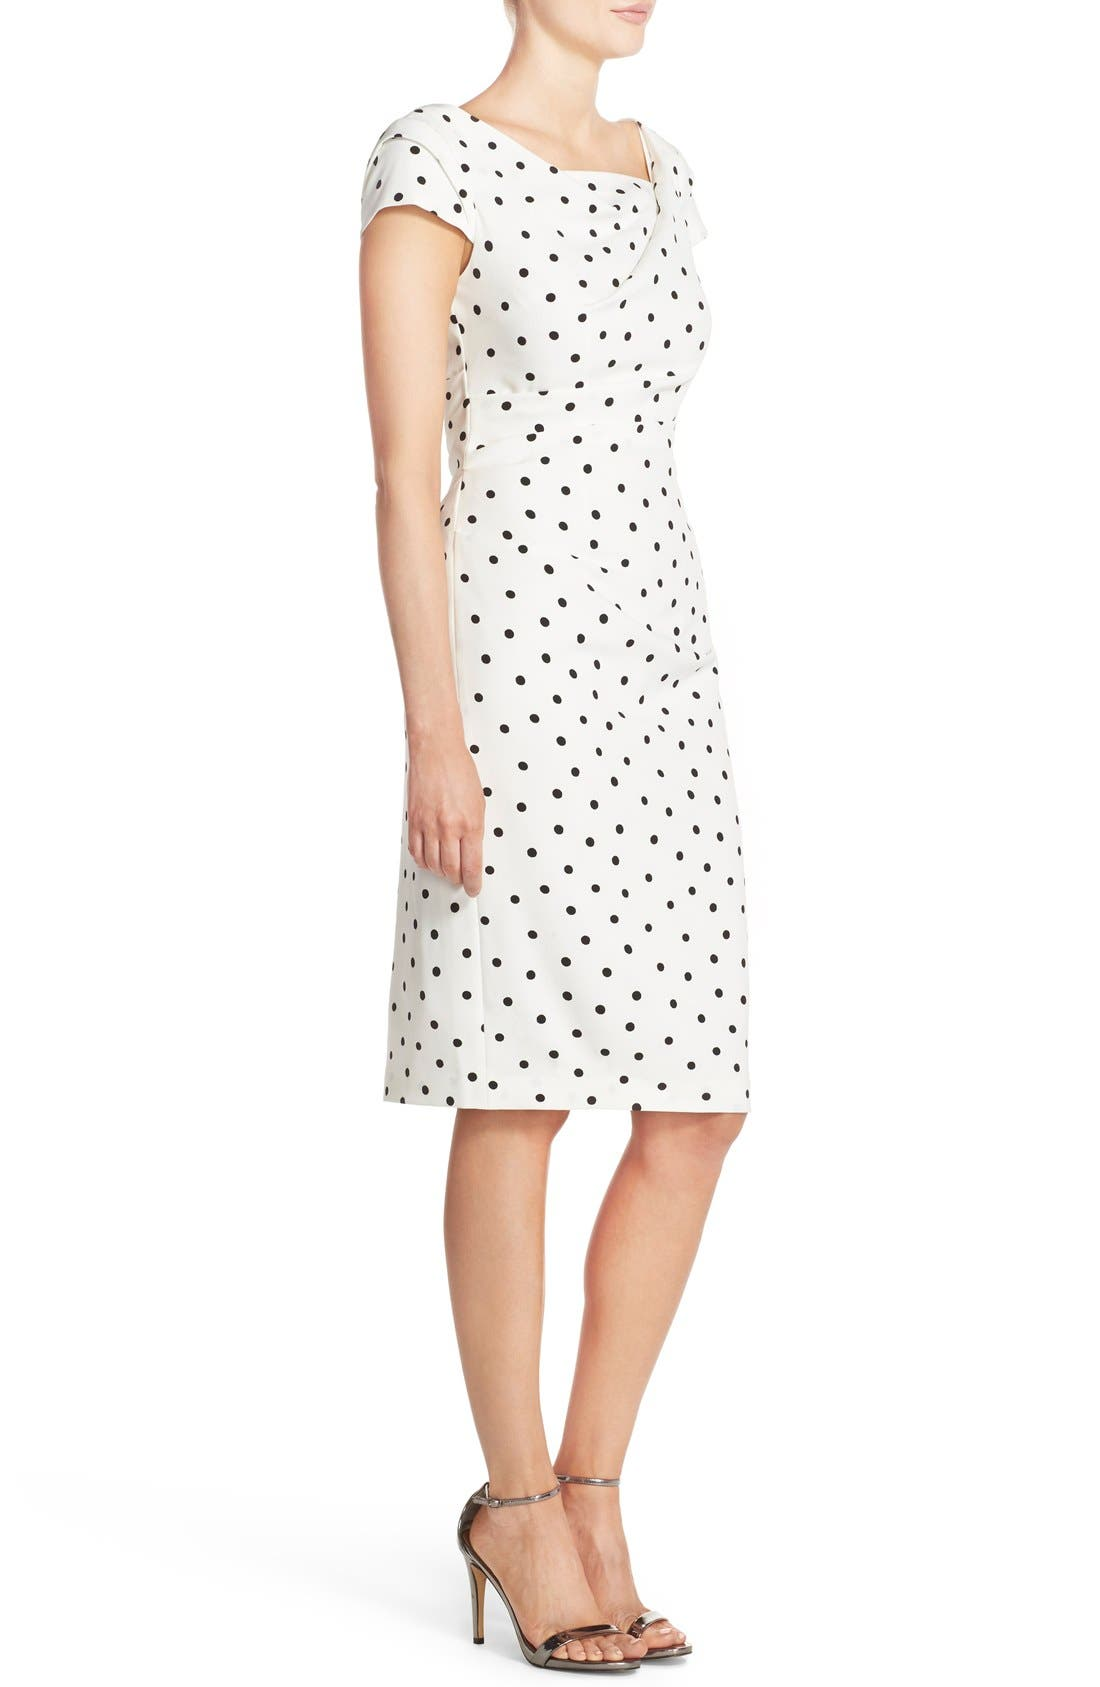 ADRIANNA PAPELL,                             Polka Dot Crepe Sheath Dress,                             Alternate thumbnail 4, color,                             900